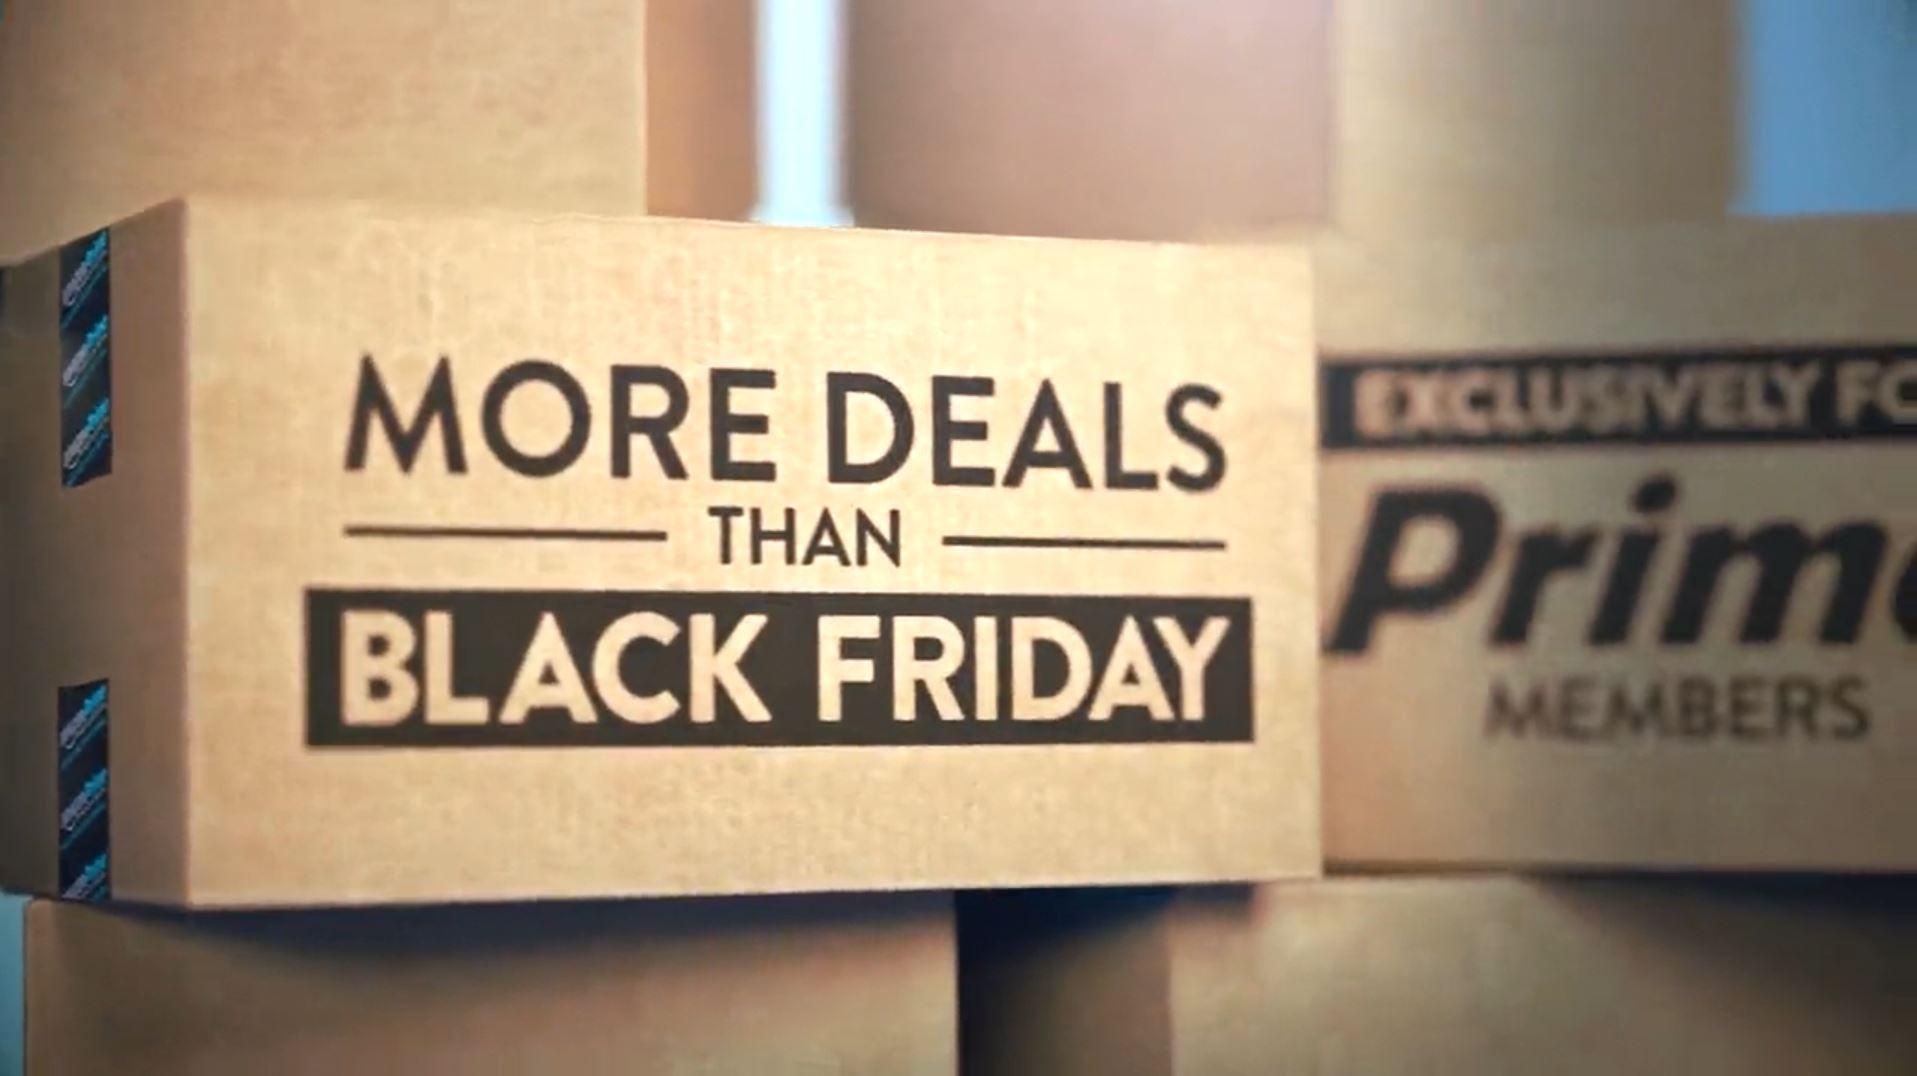 more deals than black friday